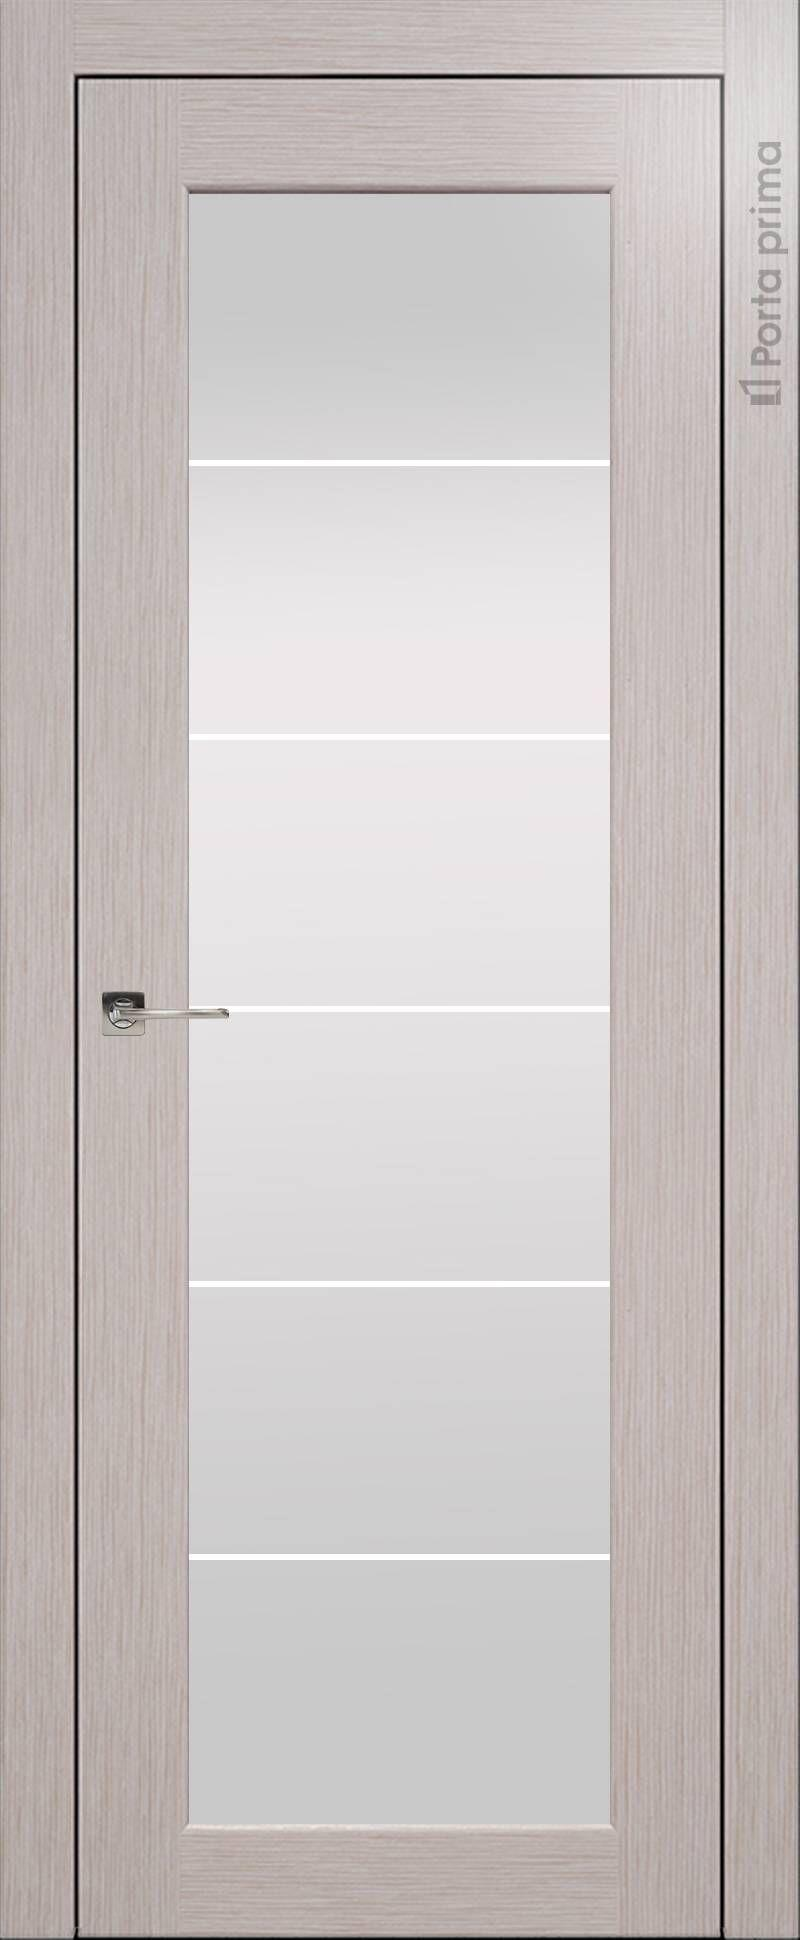 Sonata цвет - Дымчатый дуб Со стеклом (ДО)